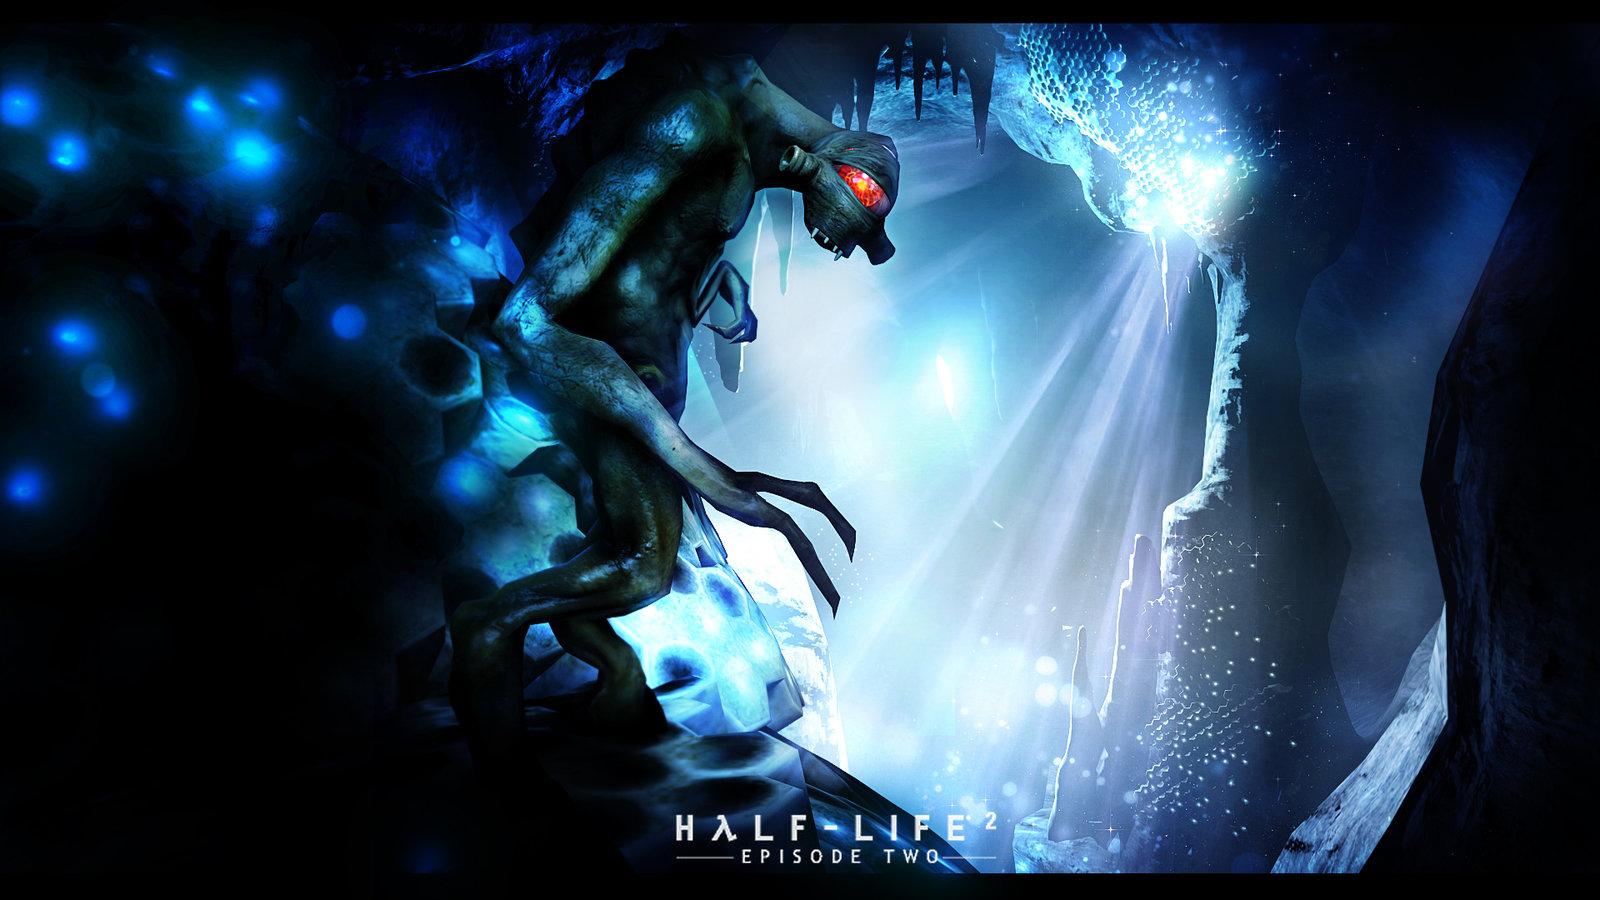 download half life 2 episode 2 by sallibyg ray fan art 1600x900